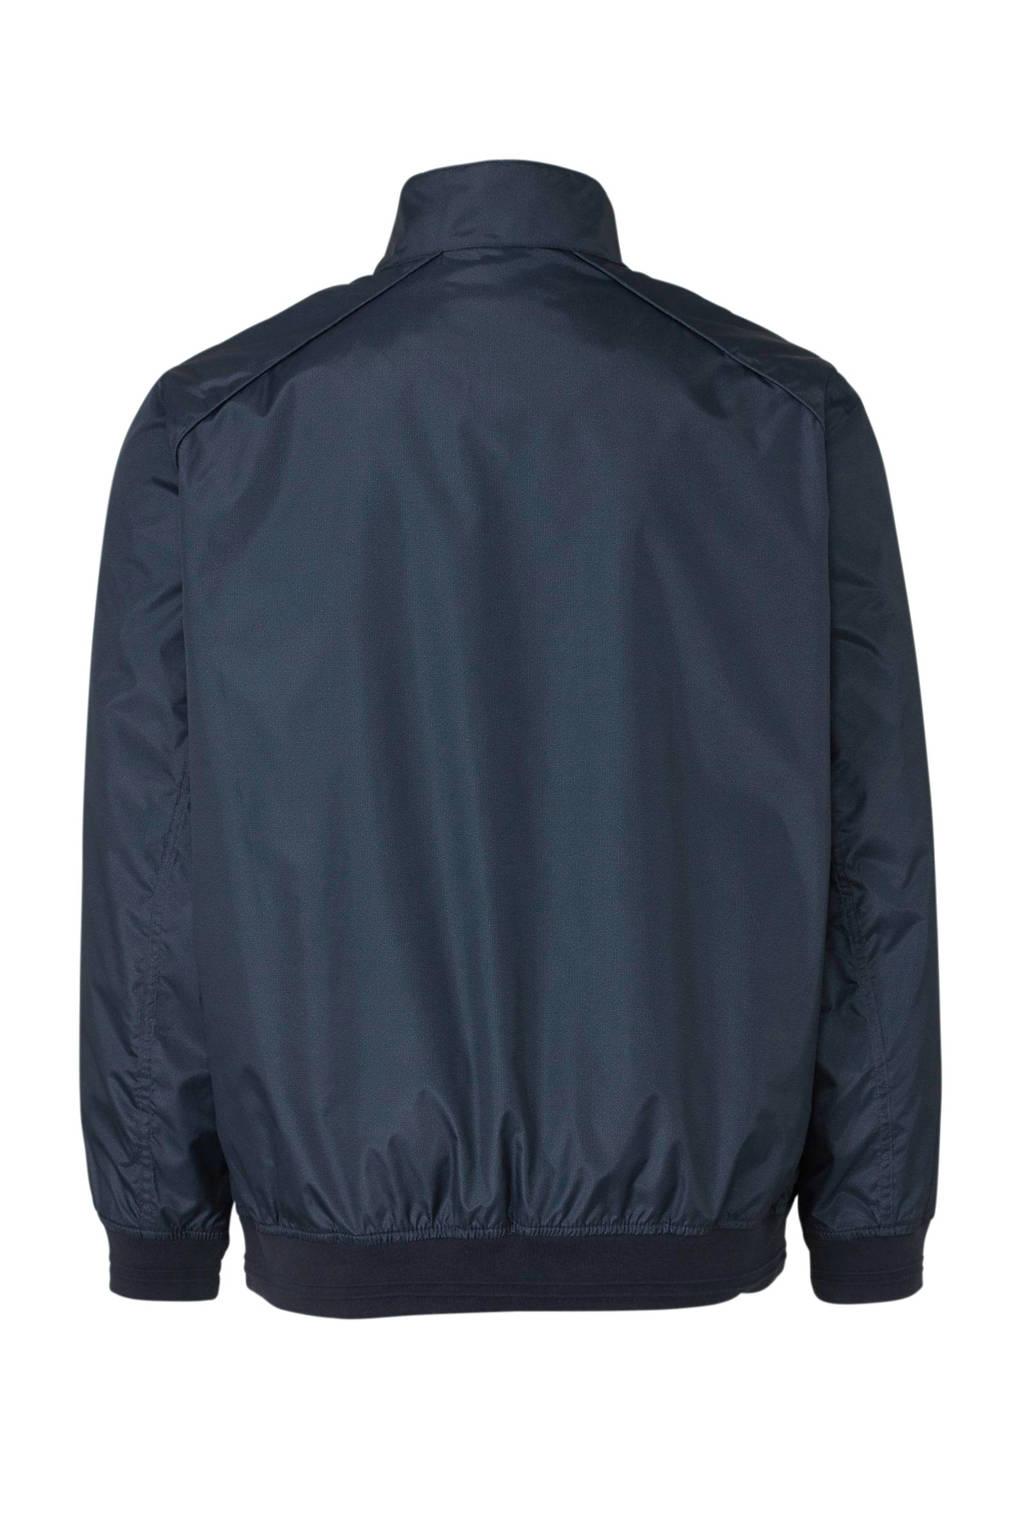 C&A XL Canda jas, Donkerblauw